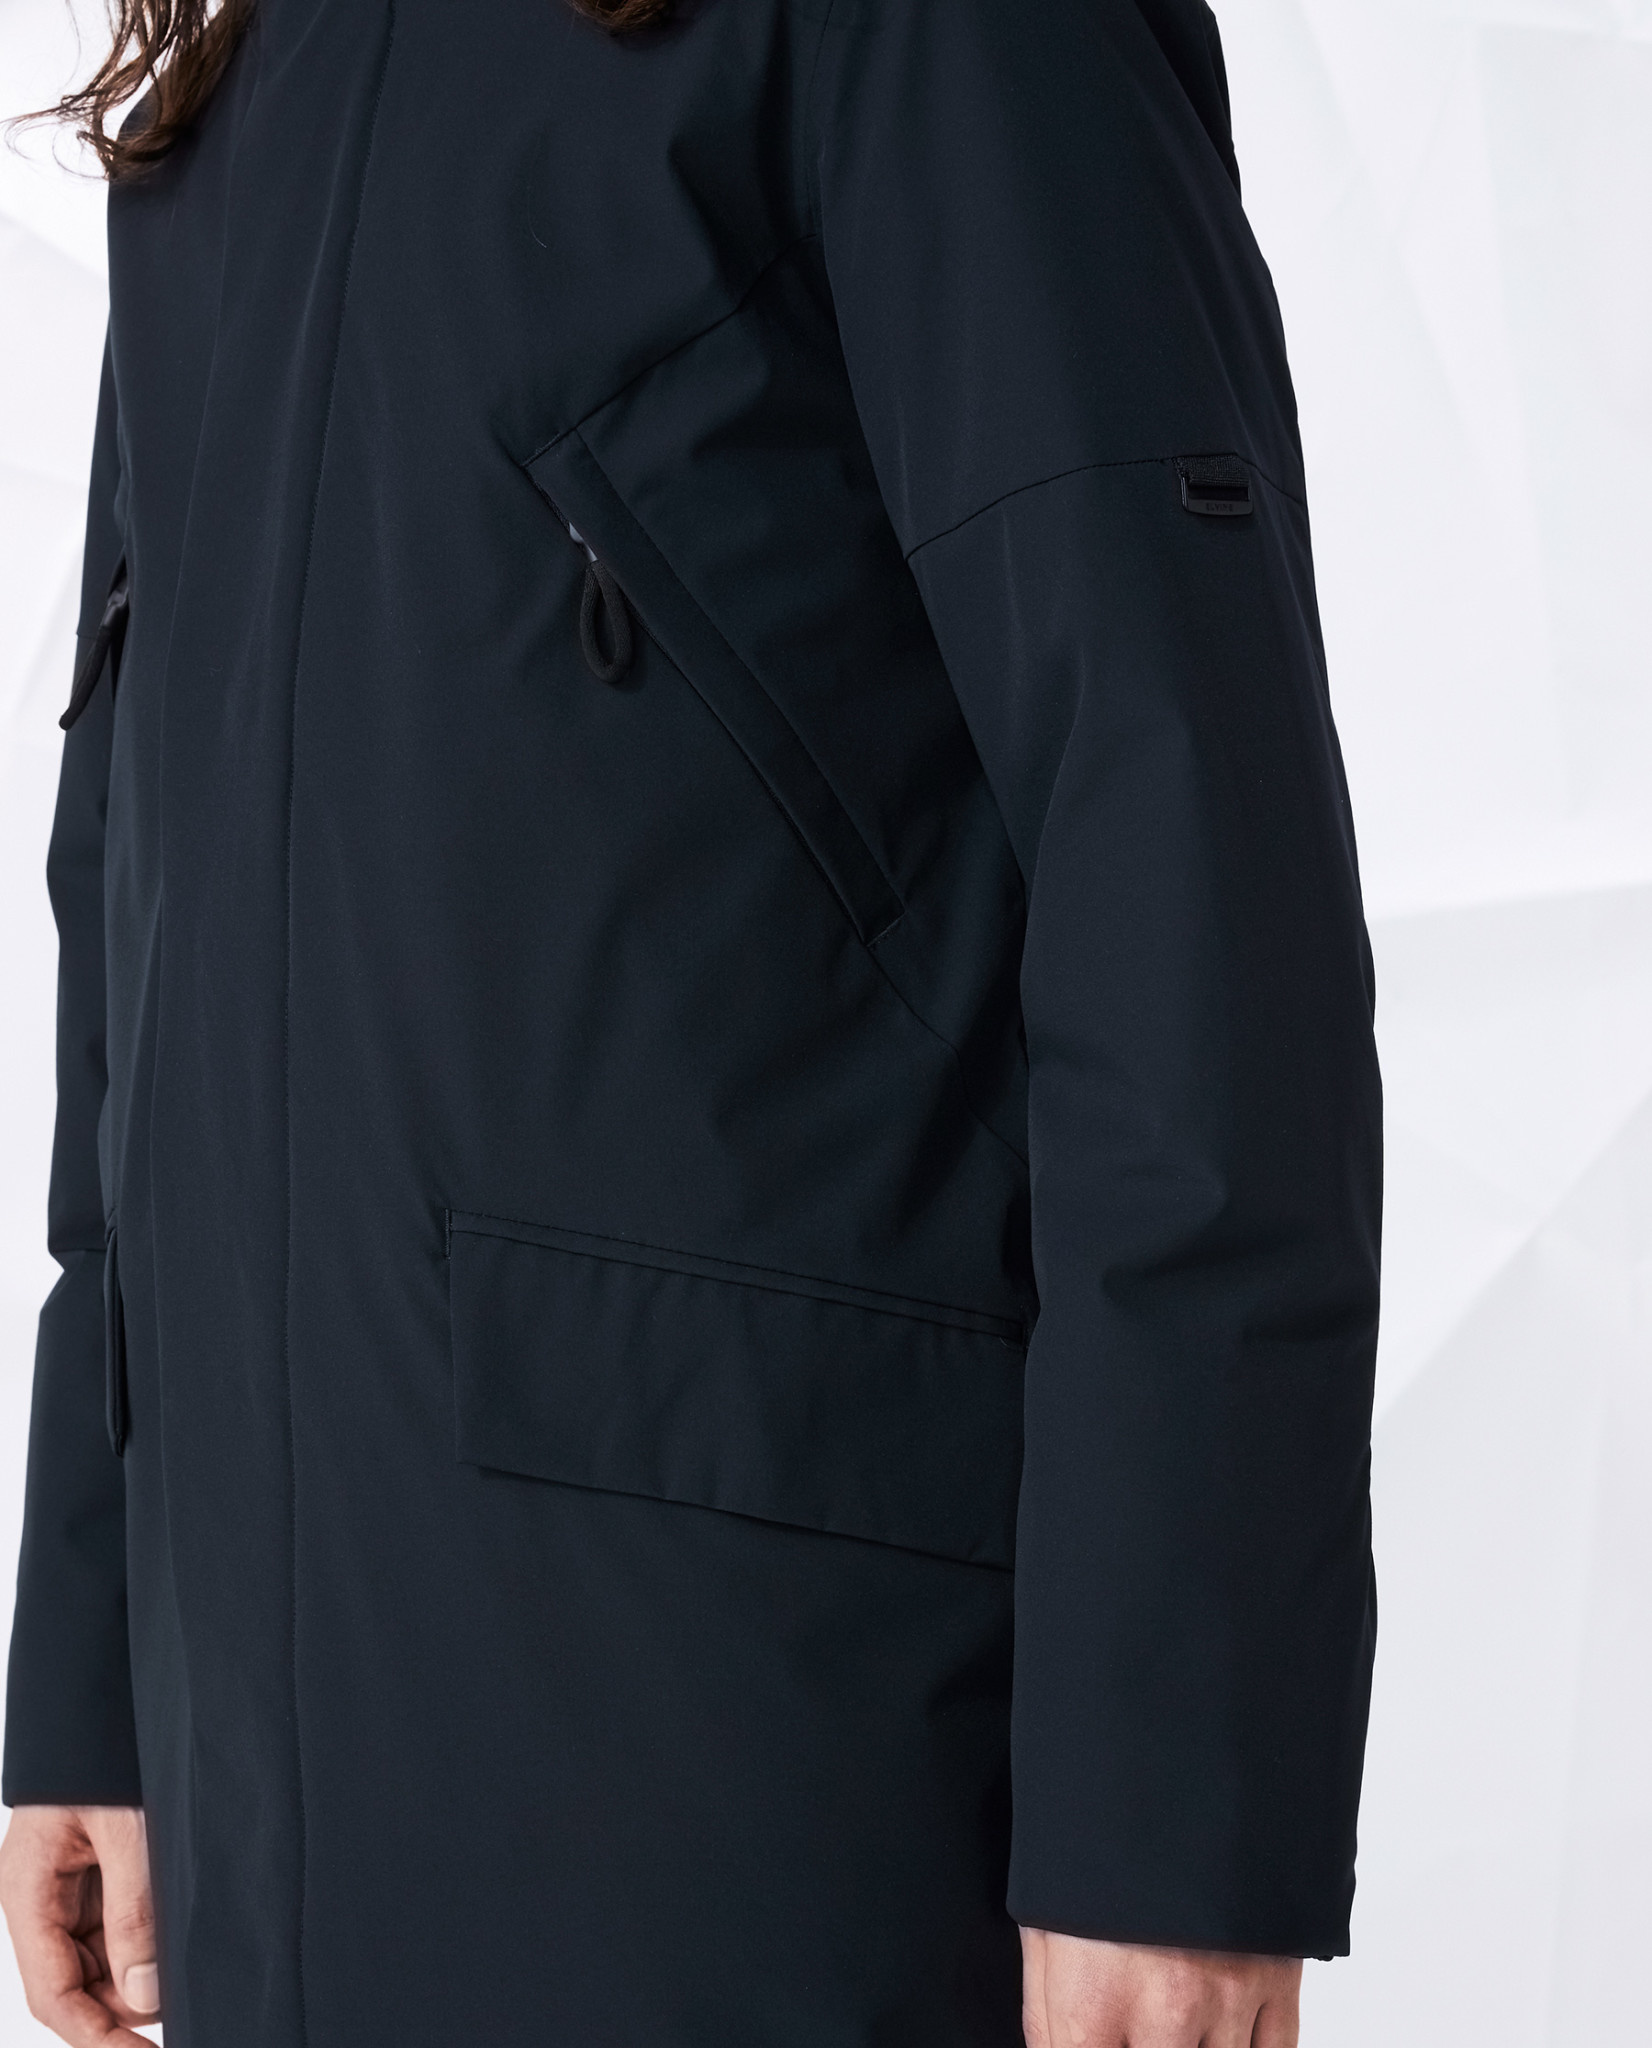 Elvine Elvine Zane Jacket Dark Navy